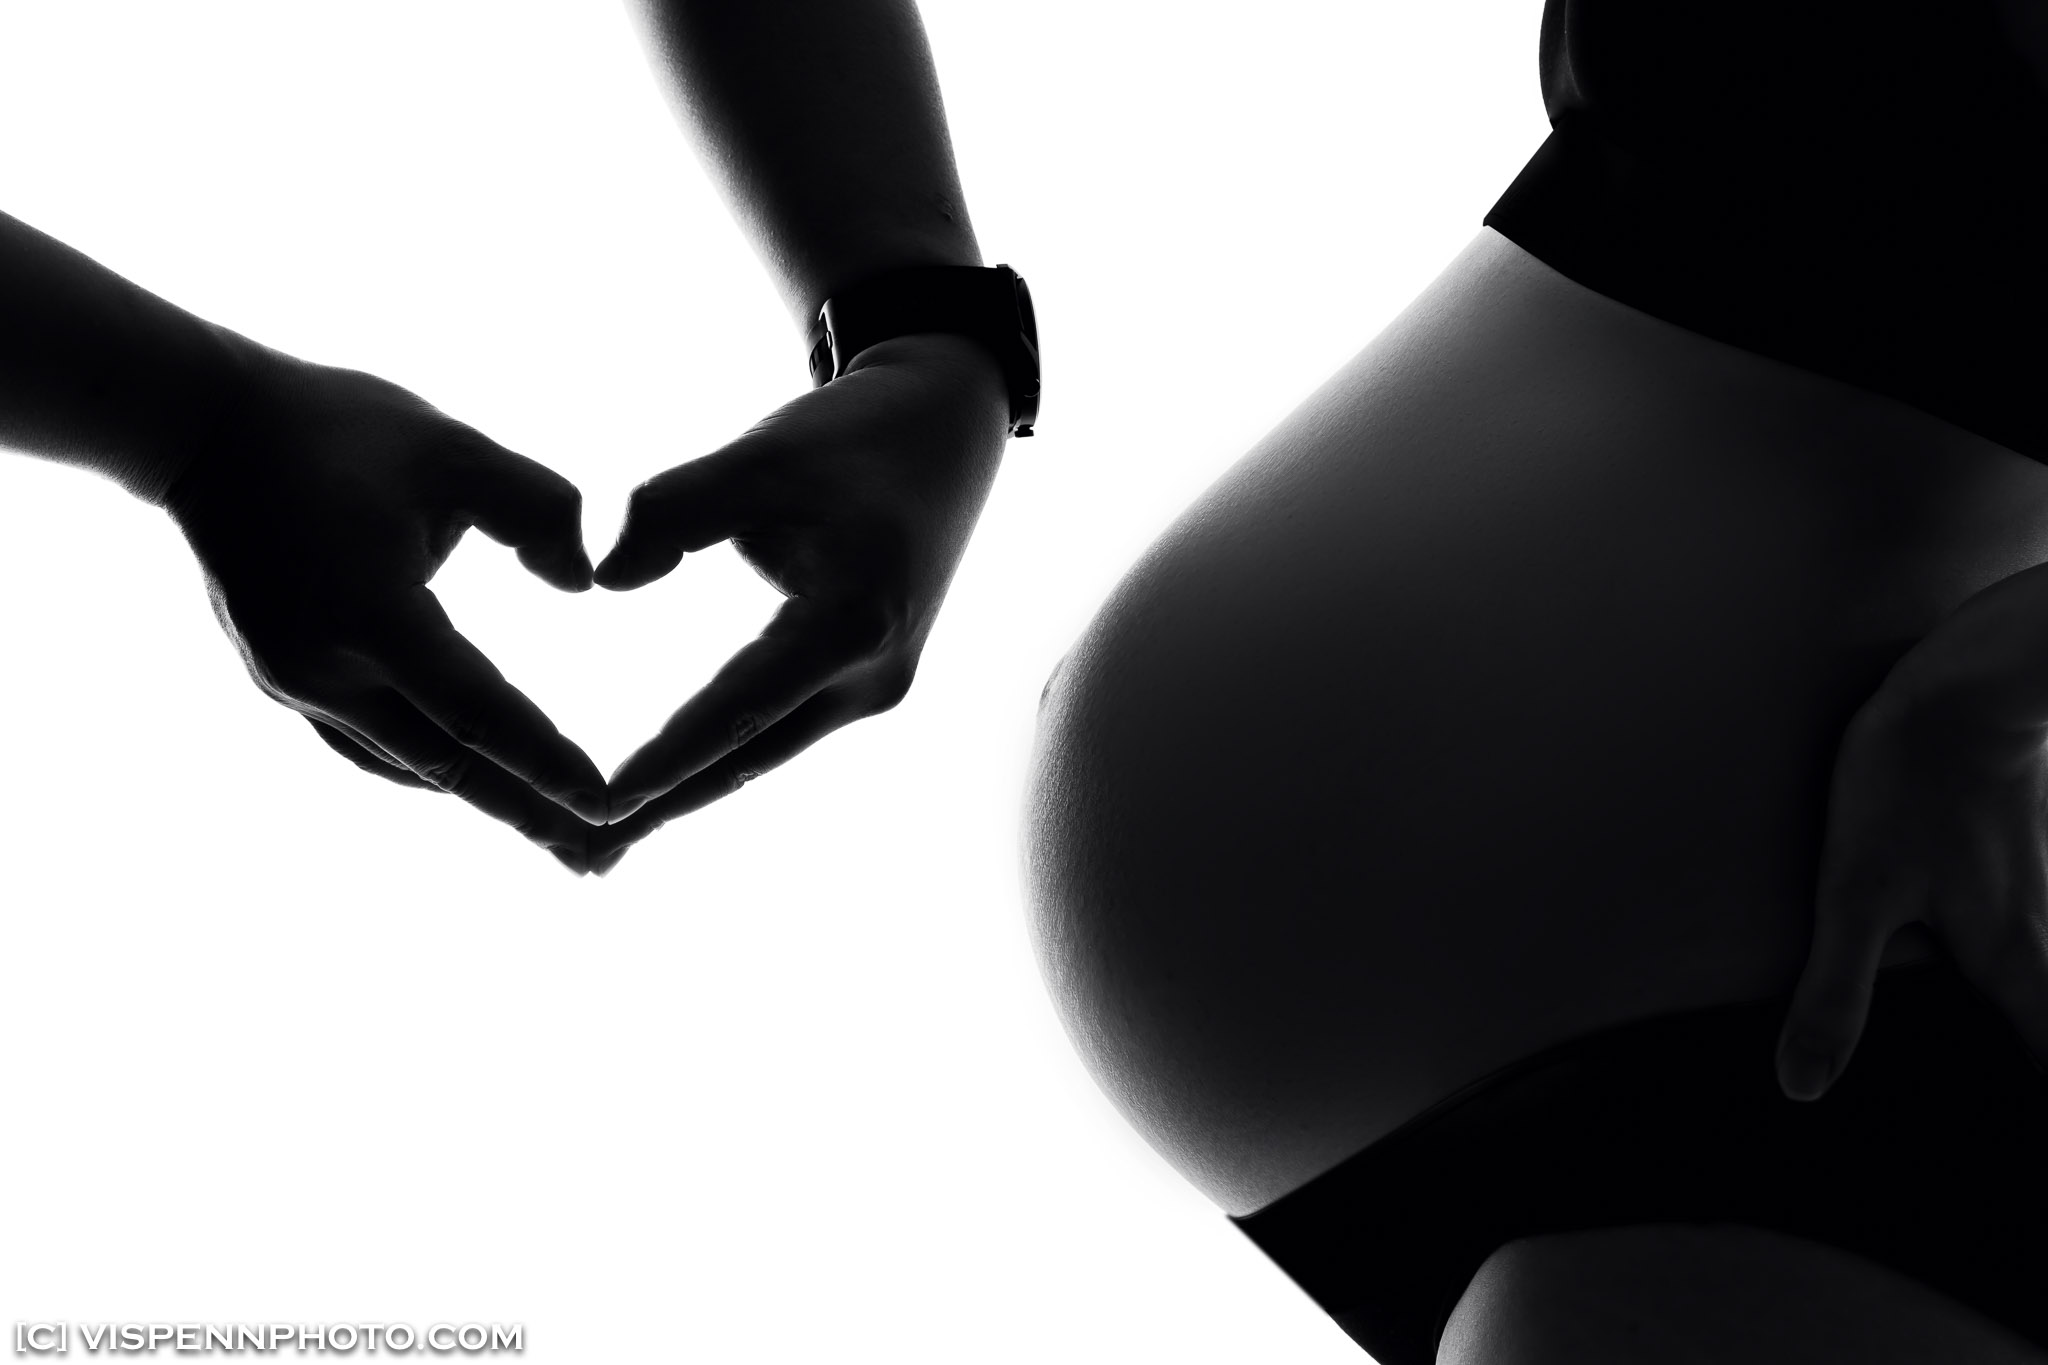 Melbourne Newborn Baby Maternity Family Photo VISPENN 墨尔本 孕妇照 大肚照 FeifeiGU 1292 VISPENN